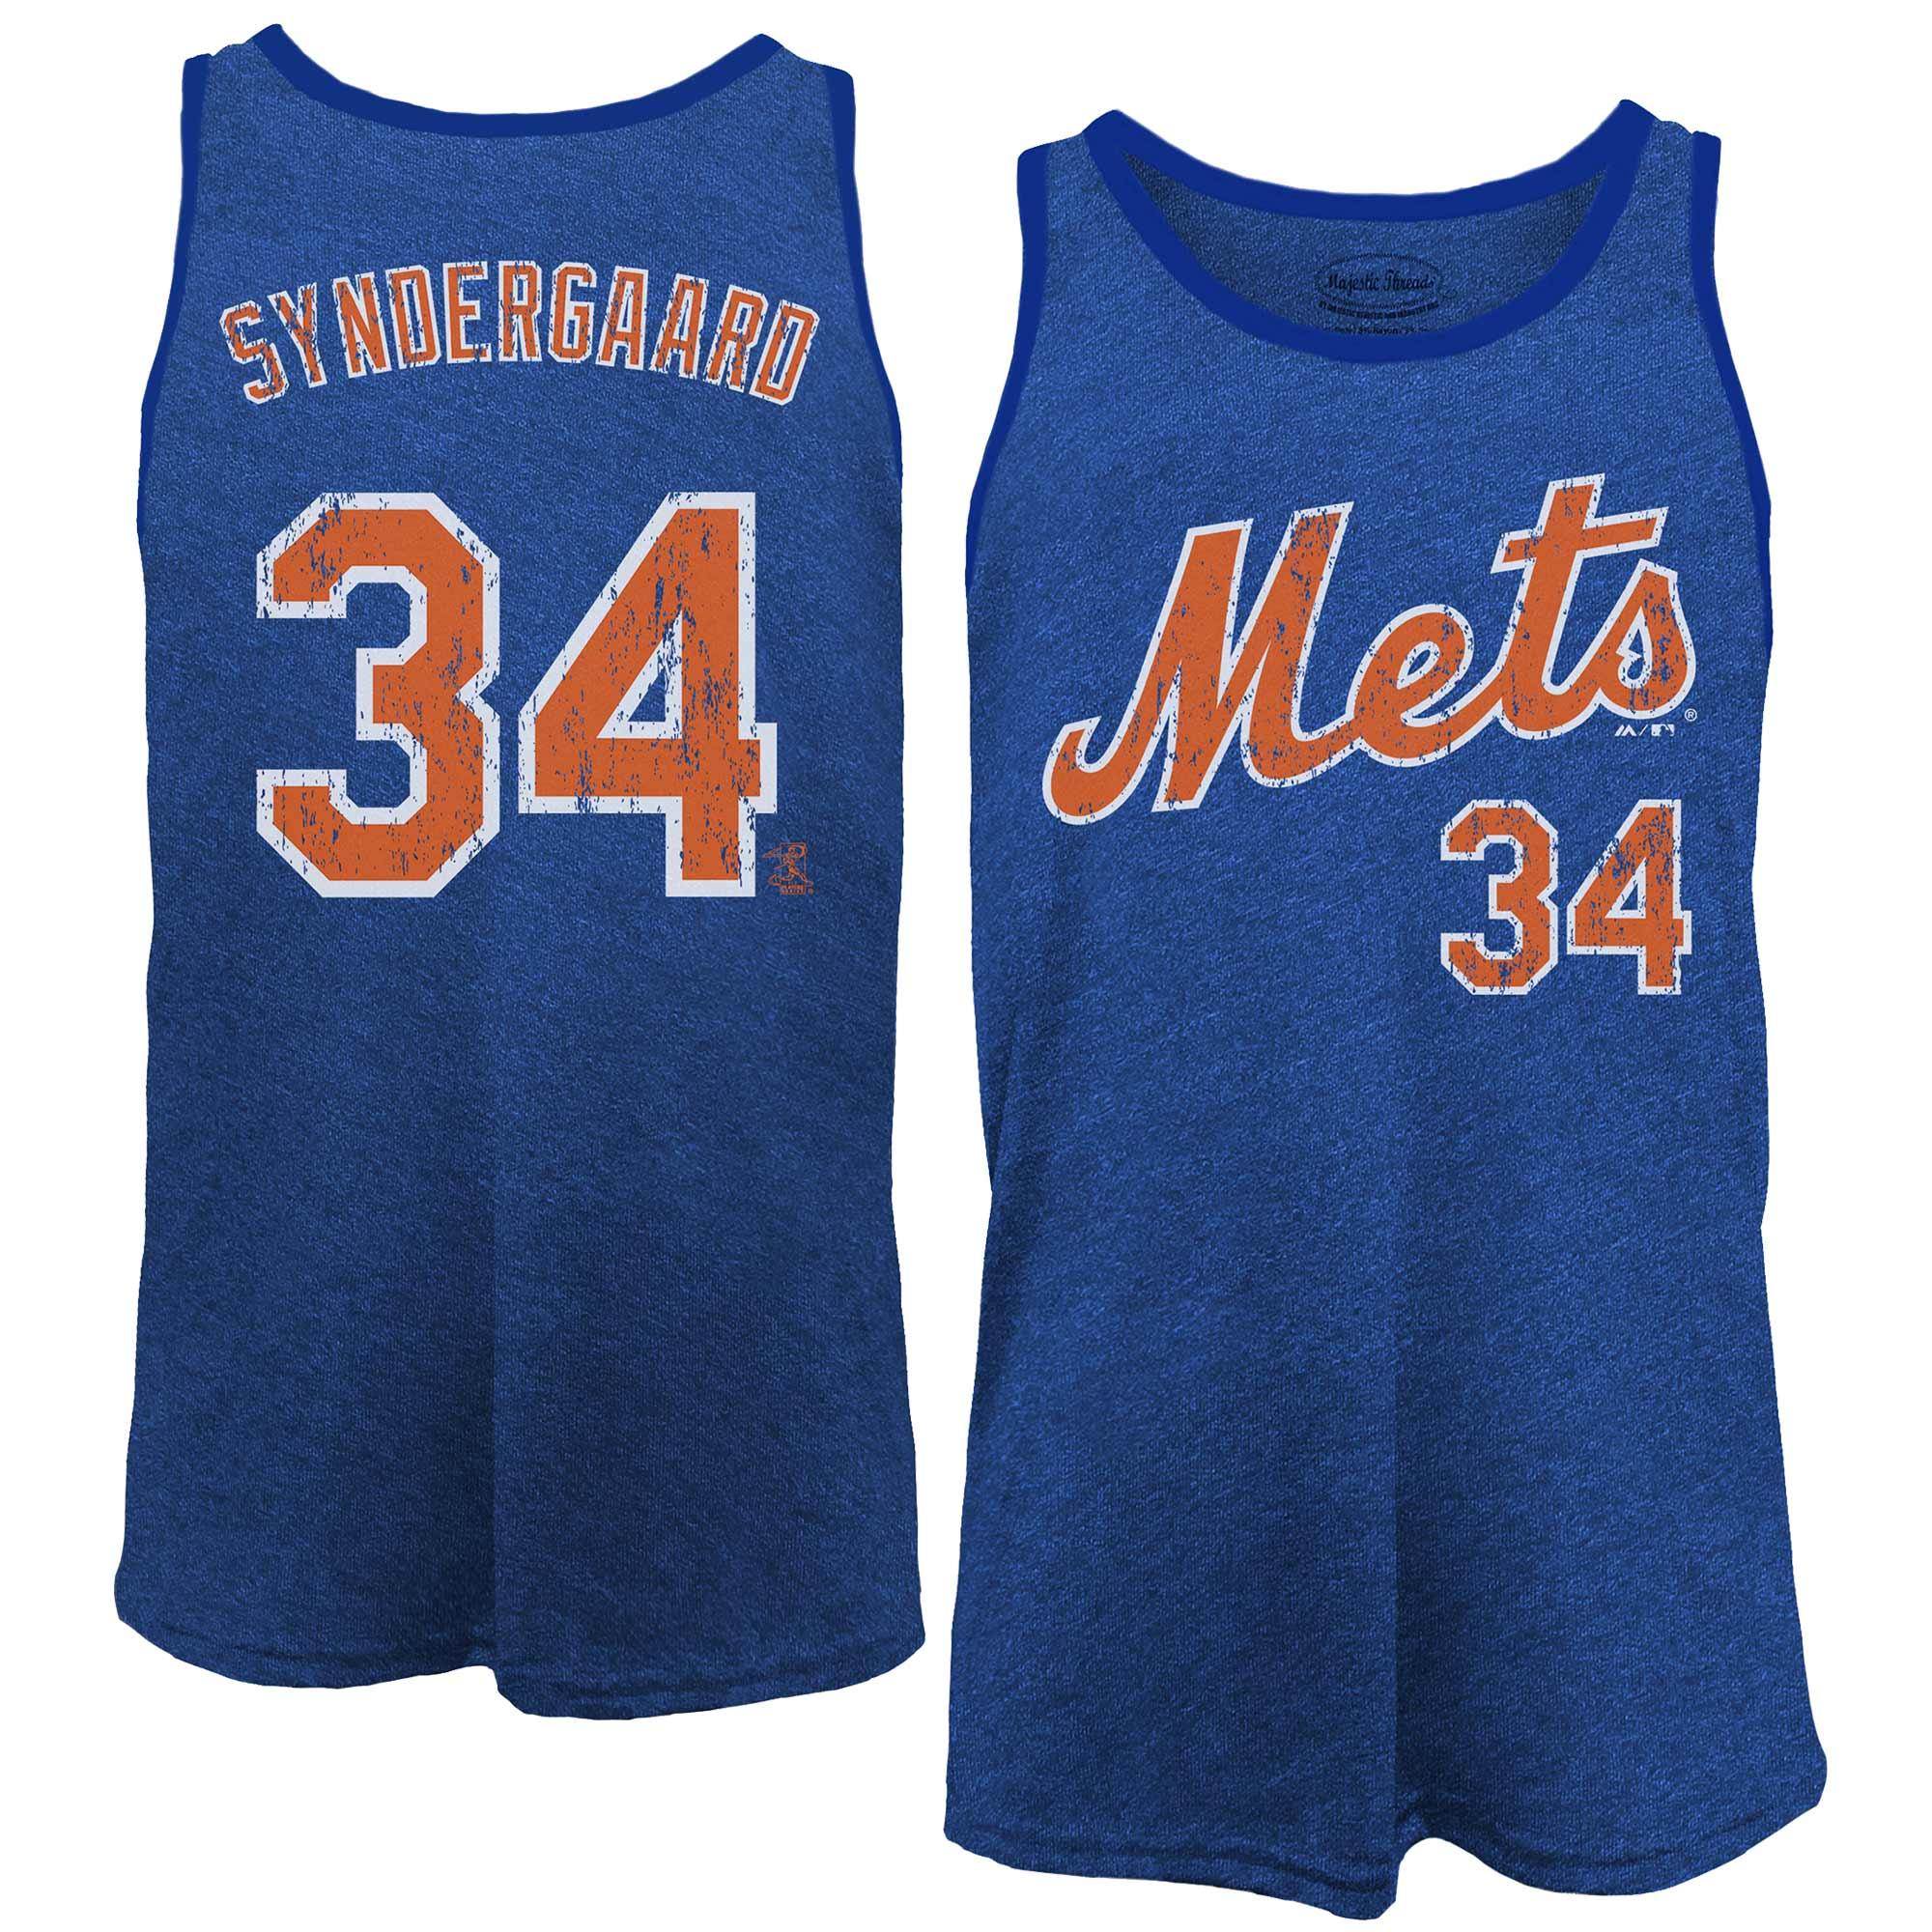 Noah Syndergaard New York Mets Majestic Threads Name & Number Tri-Blend Tank Top - Royal